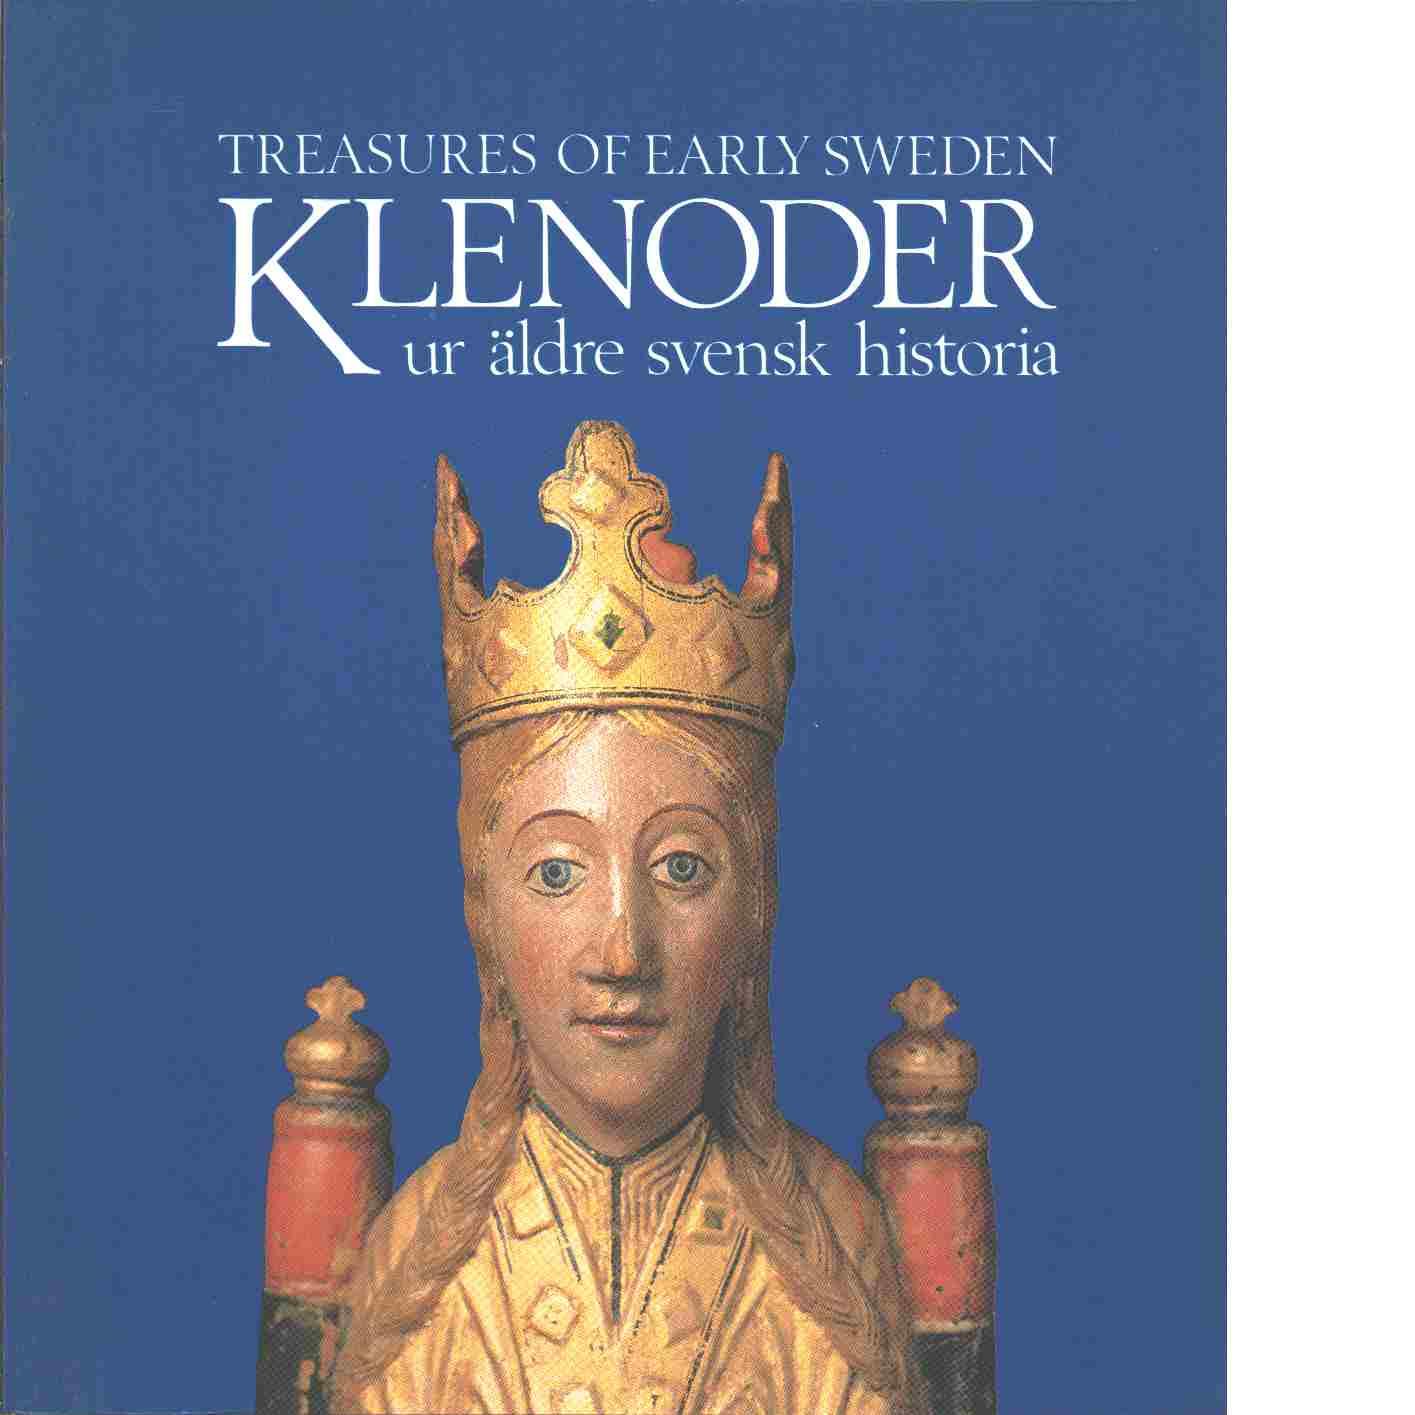 Klenoder ur äldre svensk historia : Treasures of early Sweden - Andersson, Aron och Jansson, Ingmar